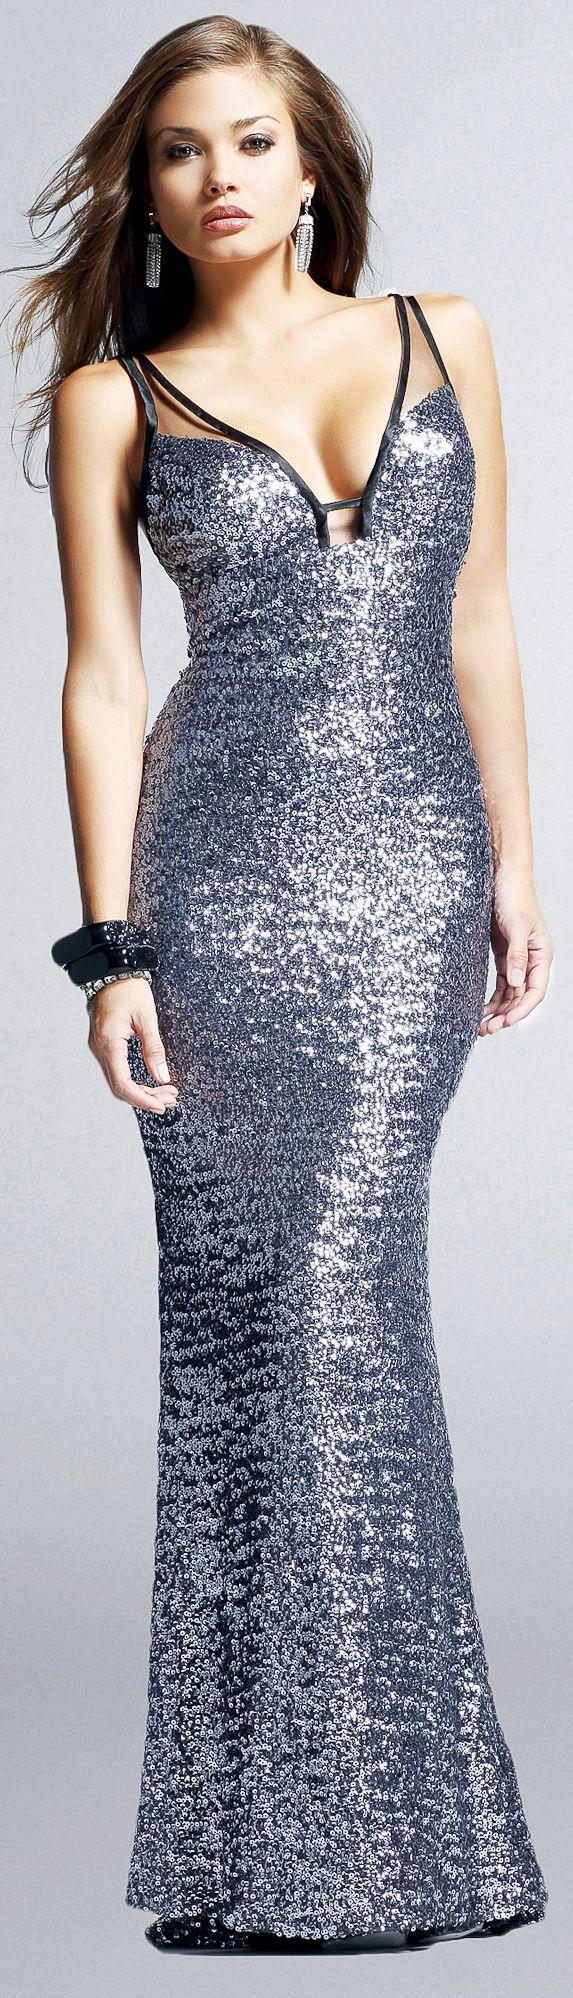 Faviana Full Length Gown-tweddingdress.com